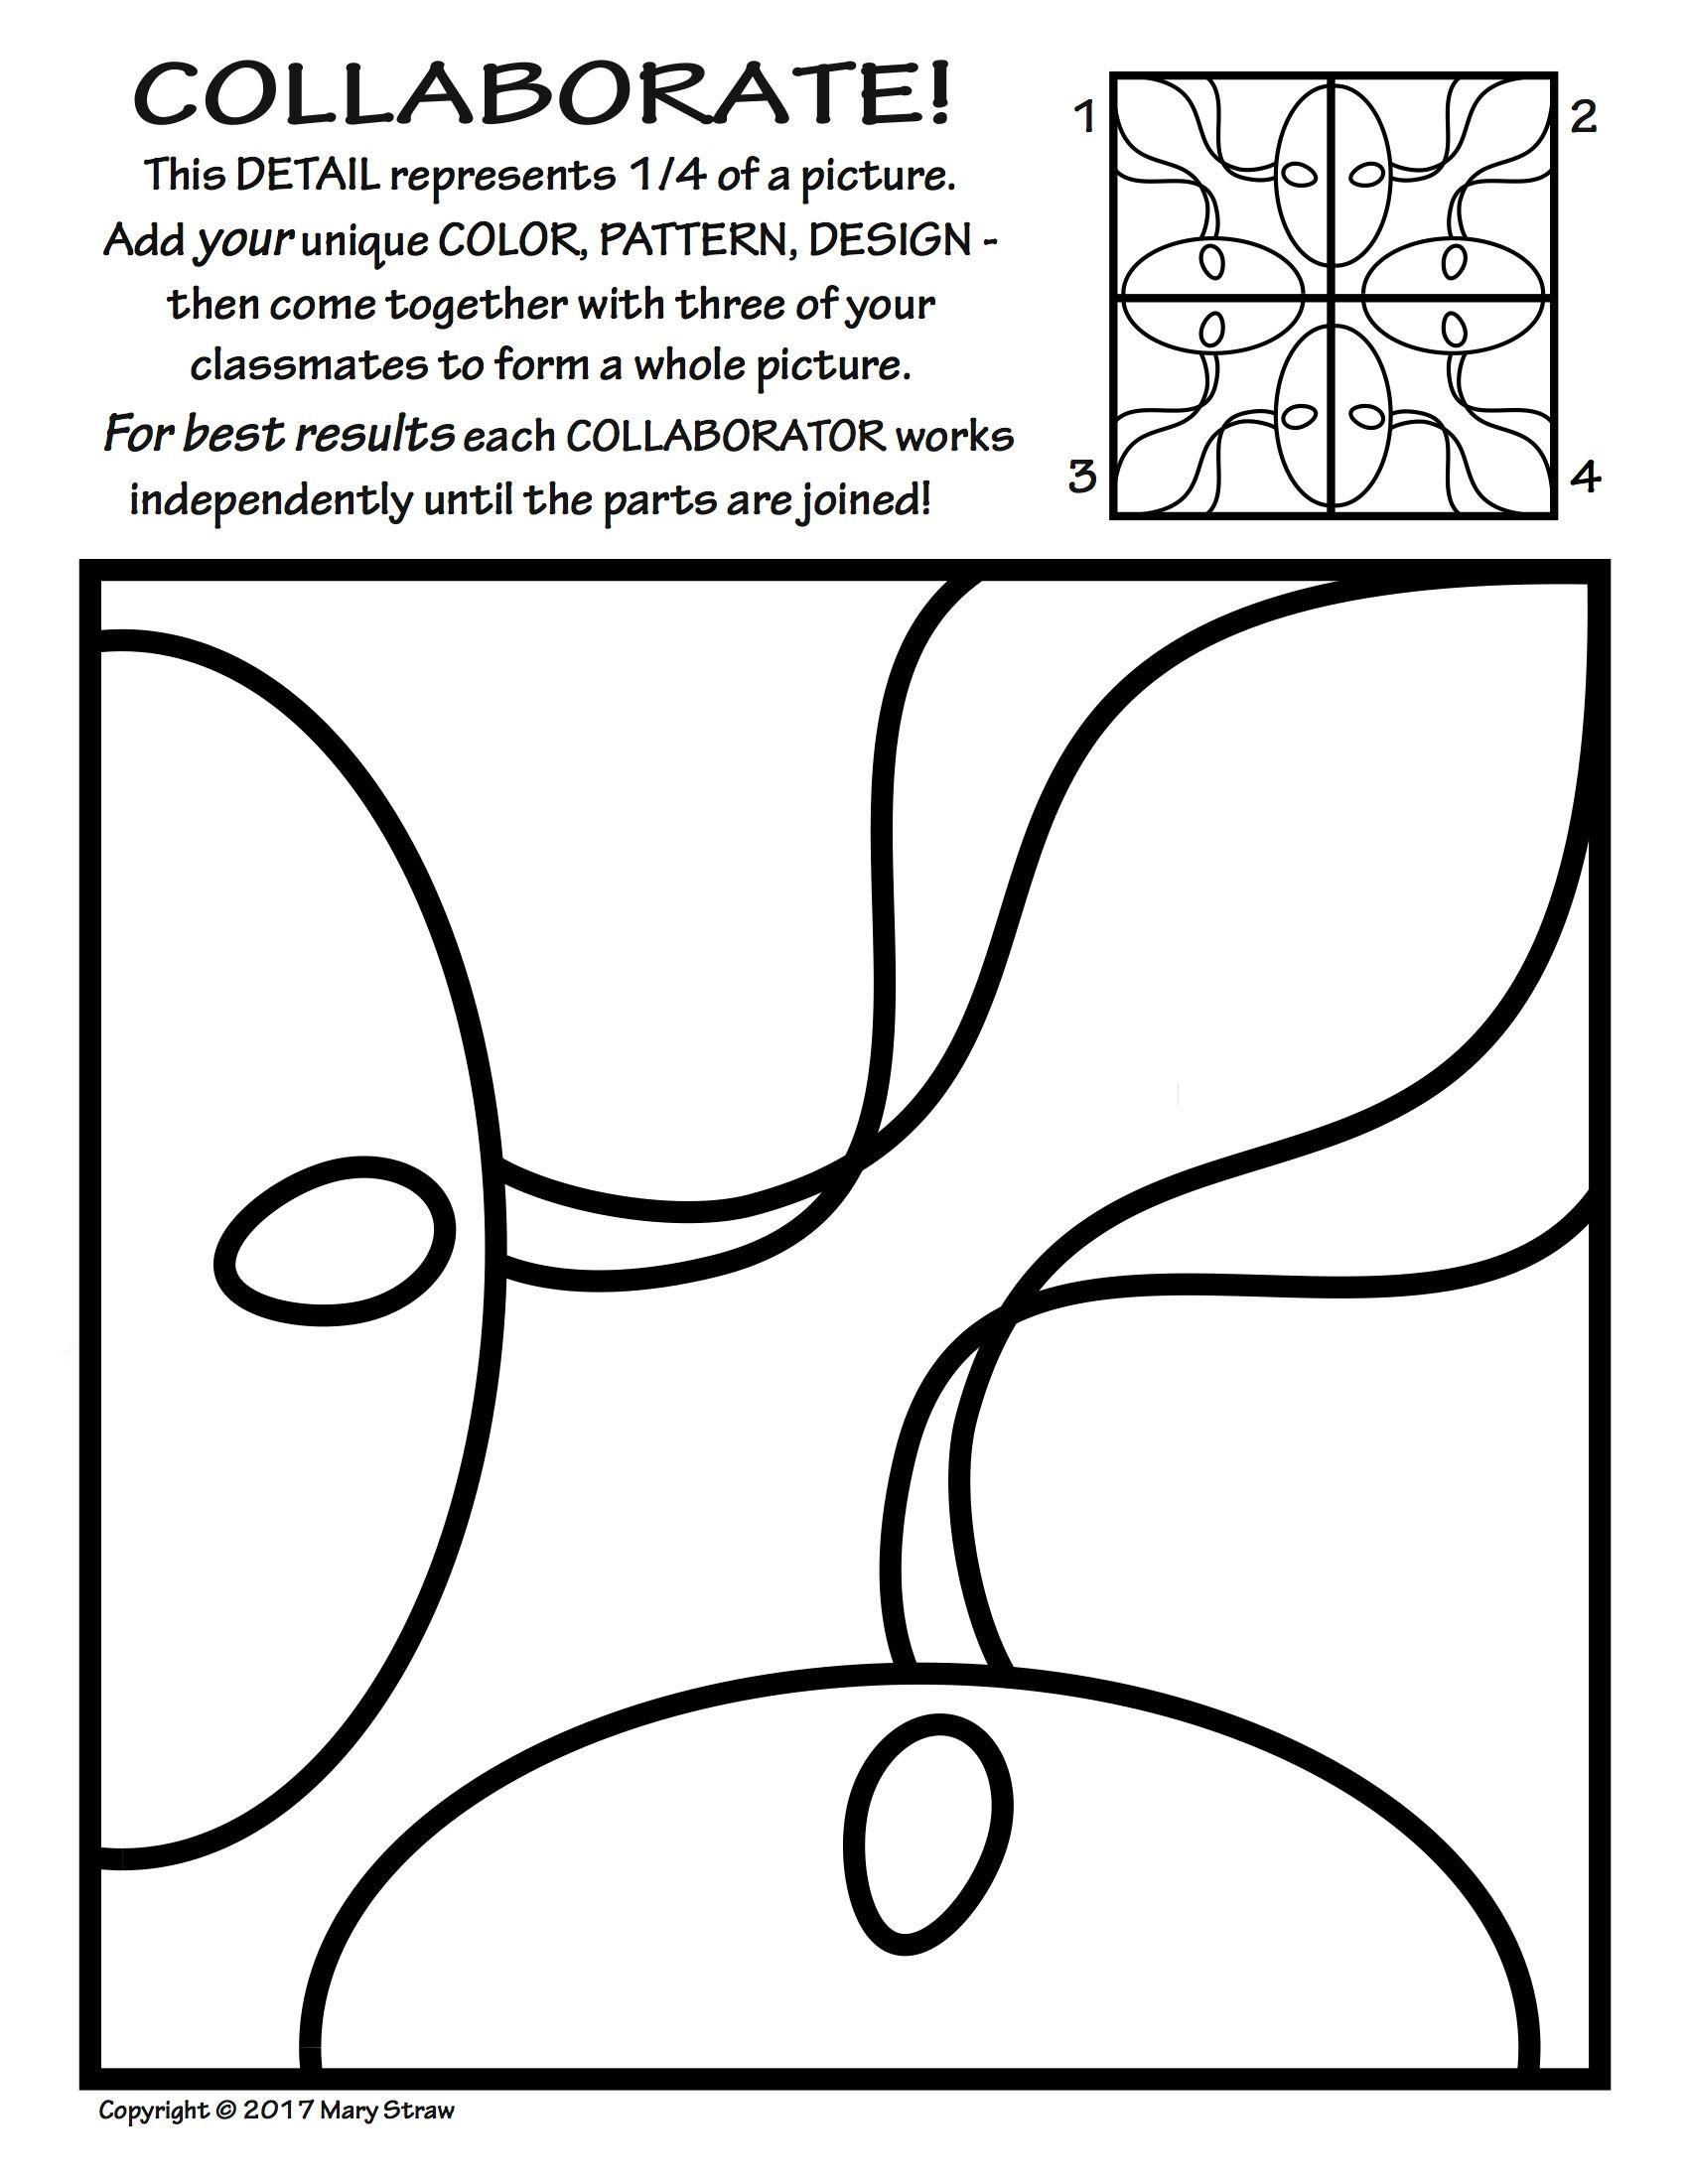 44++ Collaborate art ideas